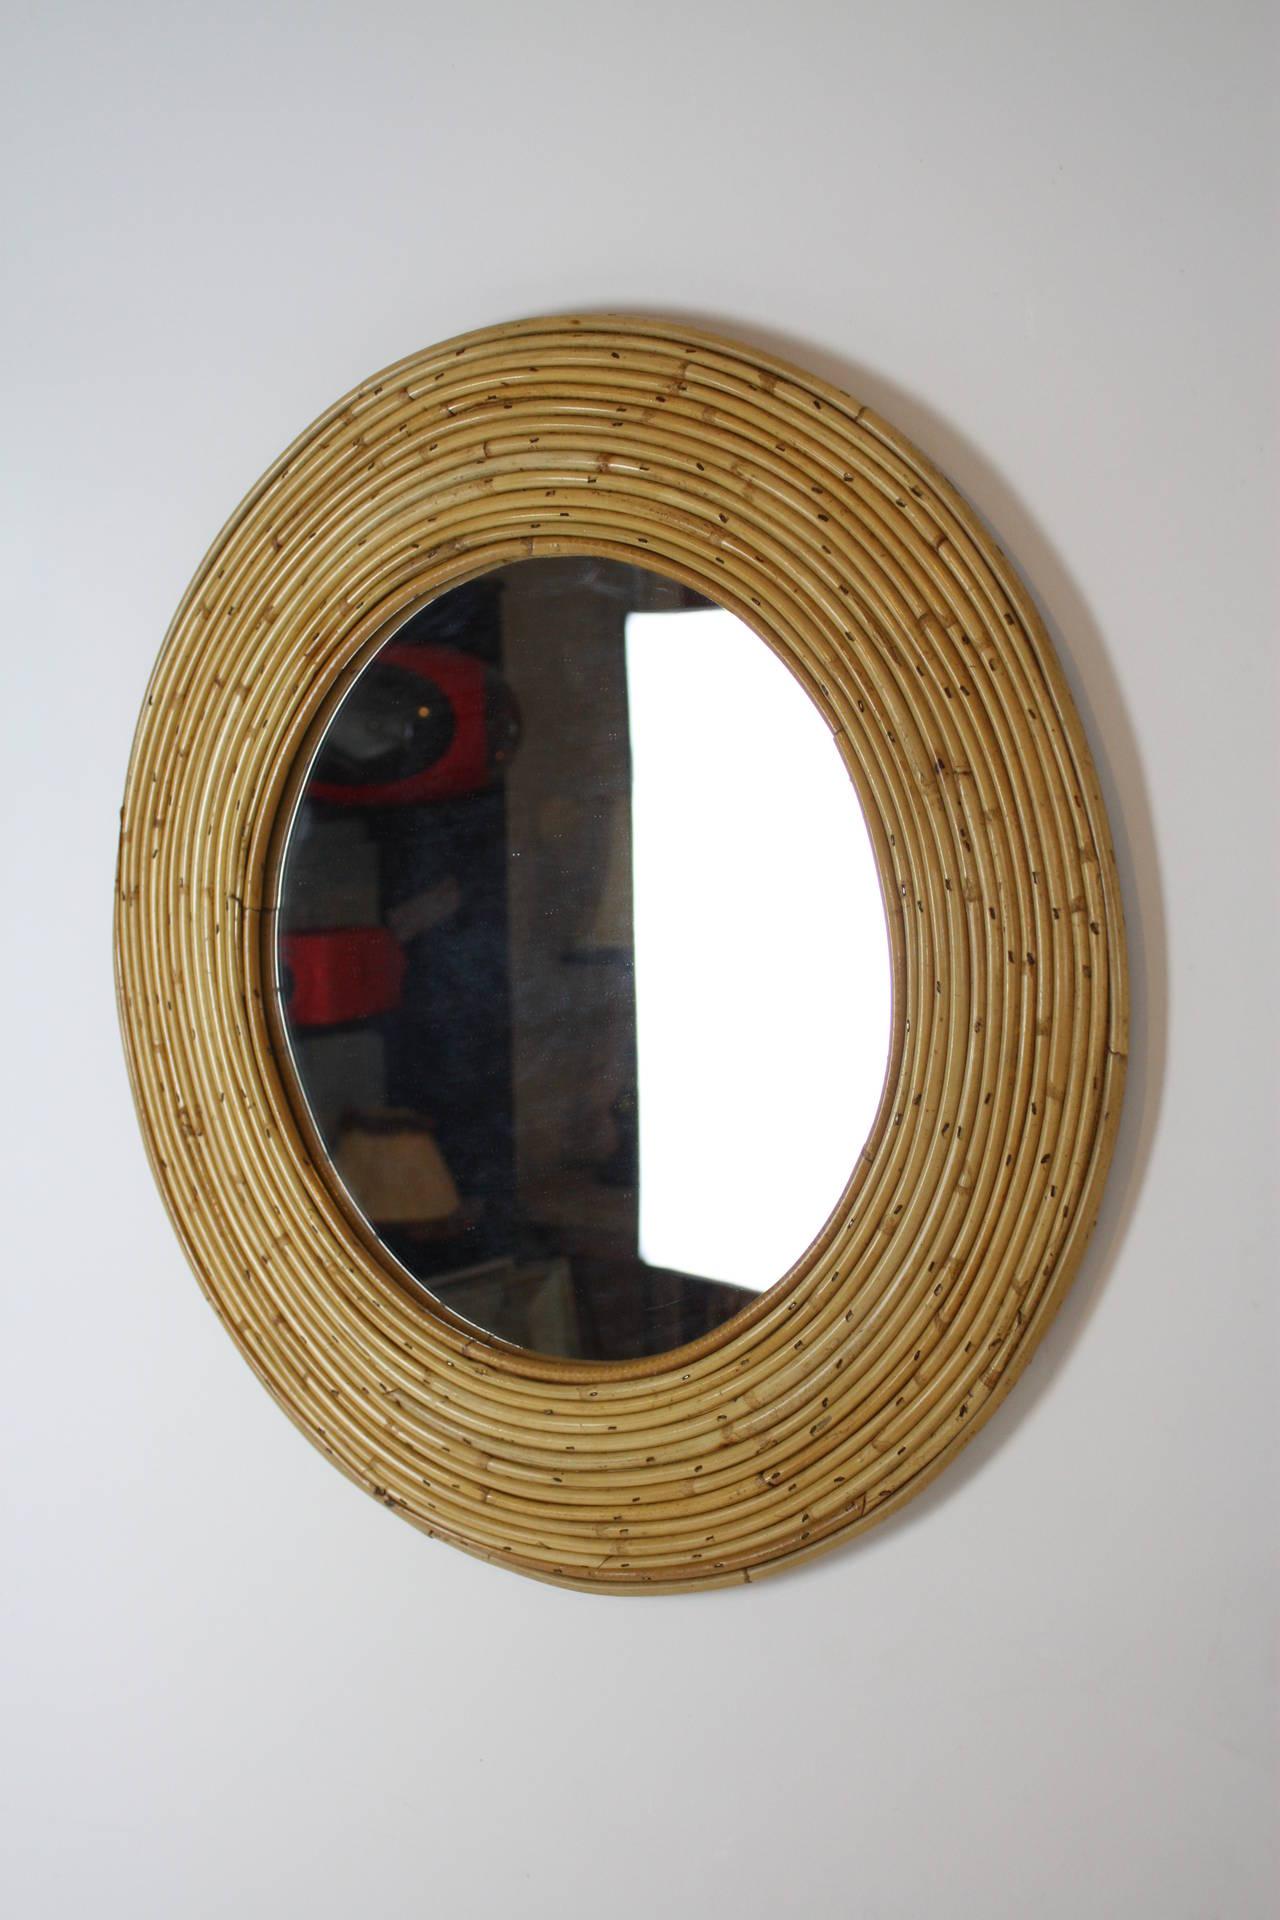 Spanish Wicker Cane Circular Mirror At 1stdibs